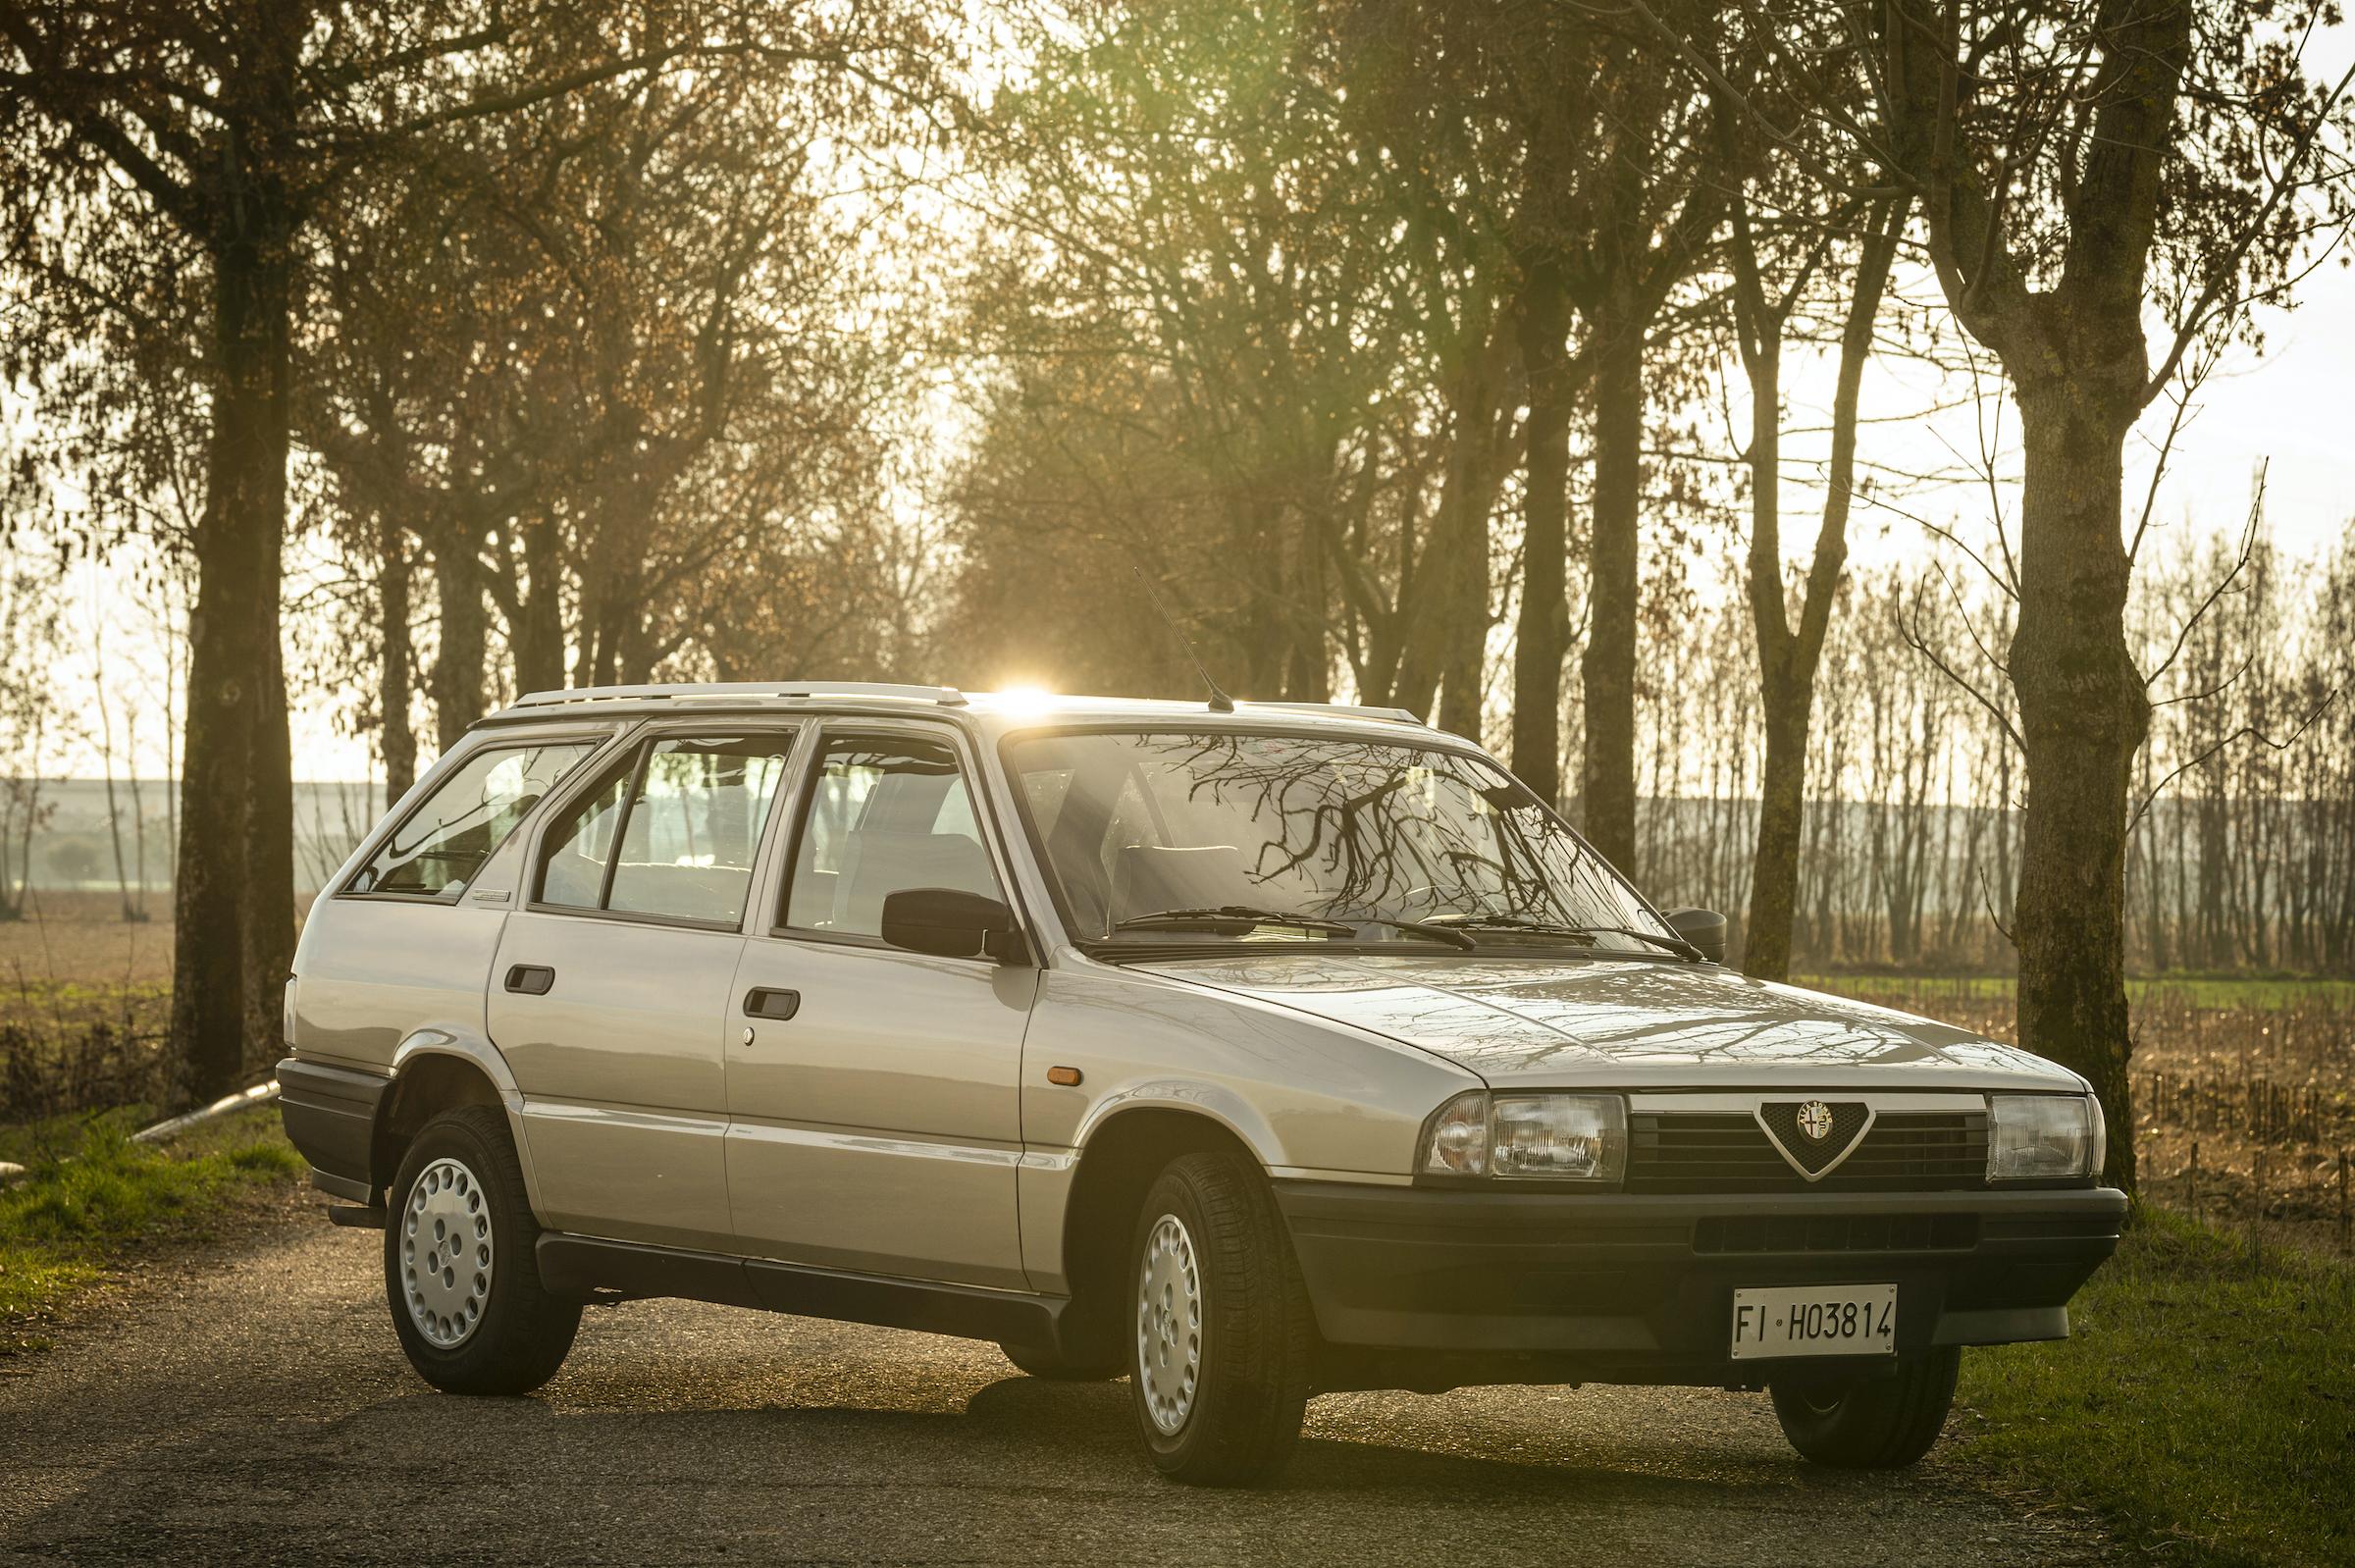 This Alfa 33 Sportwagon invites an alpine road trip